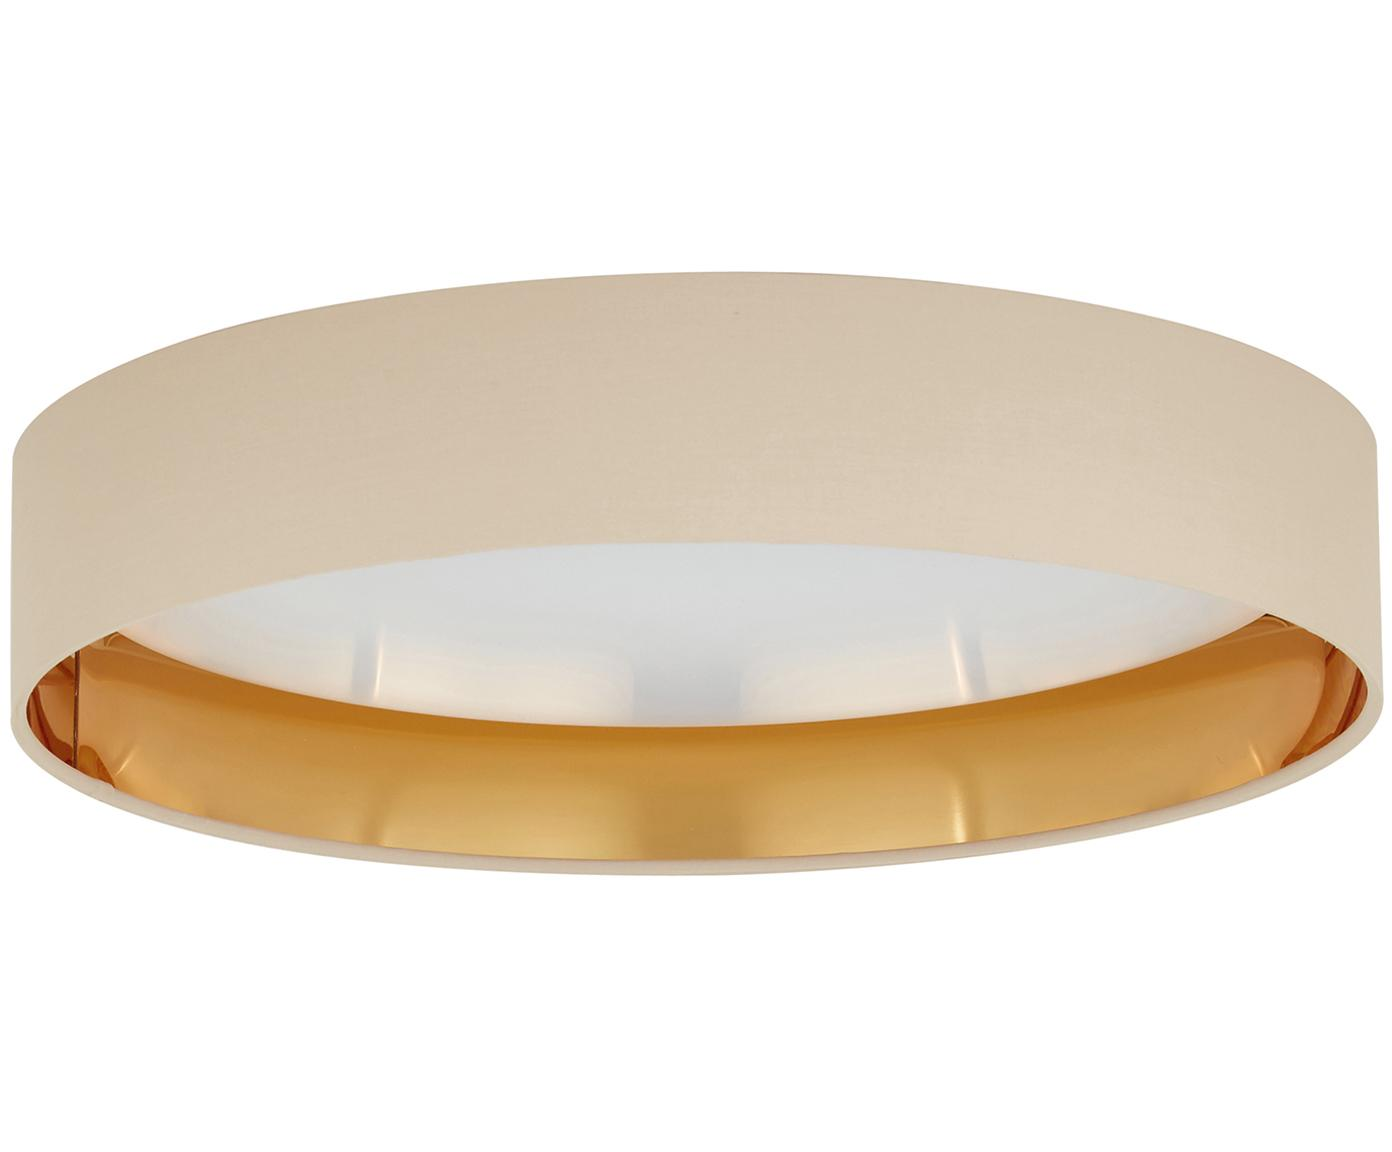 Plafón LED Mallory, Gris pardo, Ø 41 x Al 10 cm